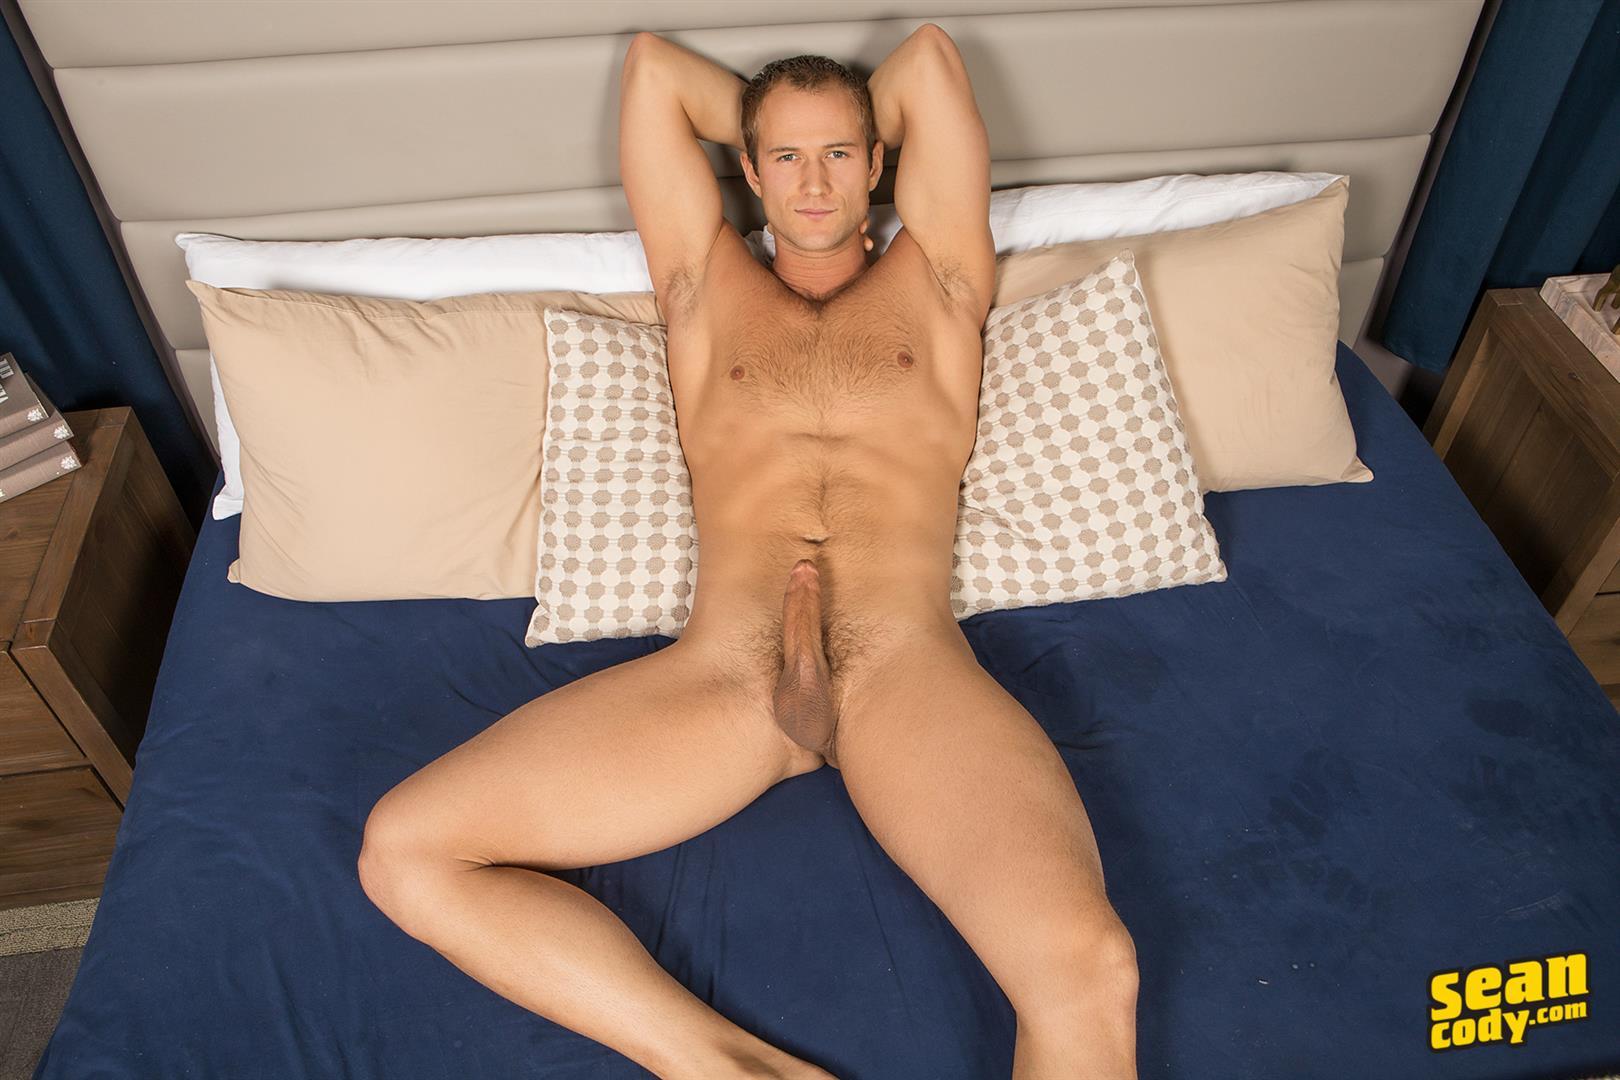 Sean-Cody-Blake-and-Kaleb-Bareback-Gay-Sex-01 Sean Cody:  Blake & Kaleb Go Bareback